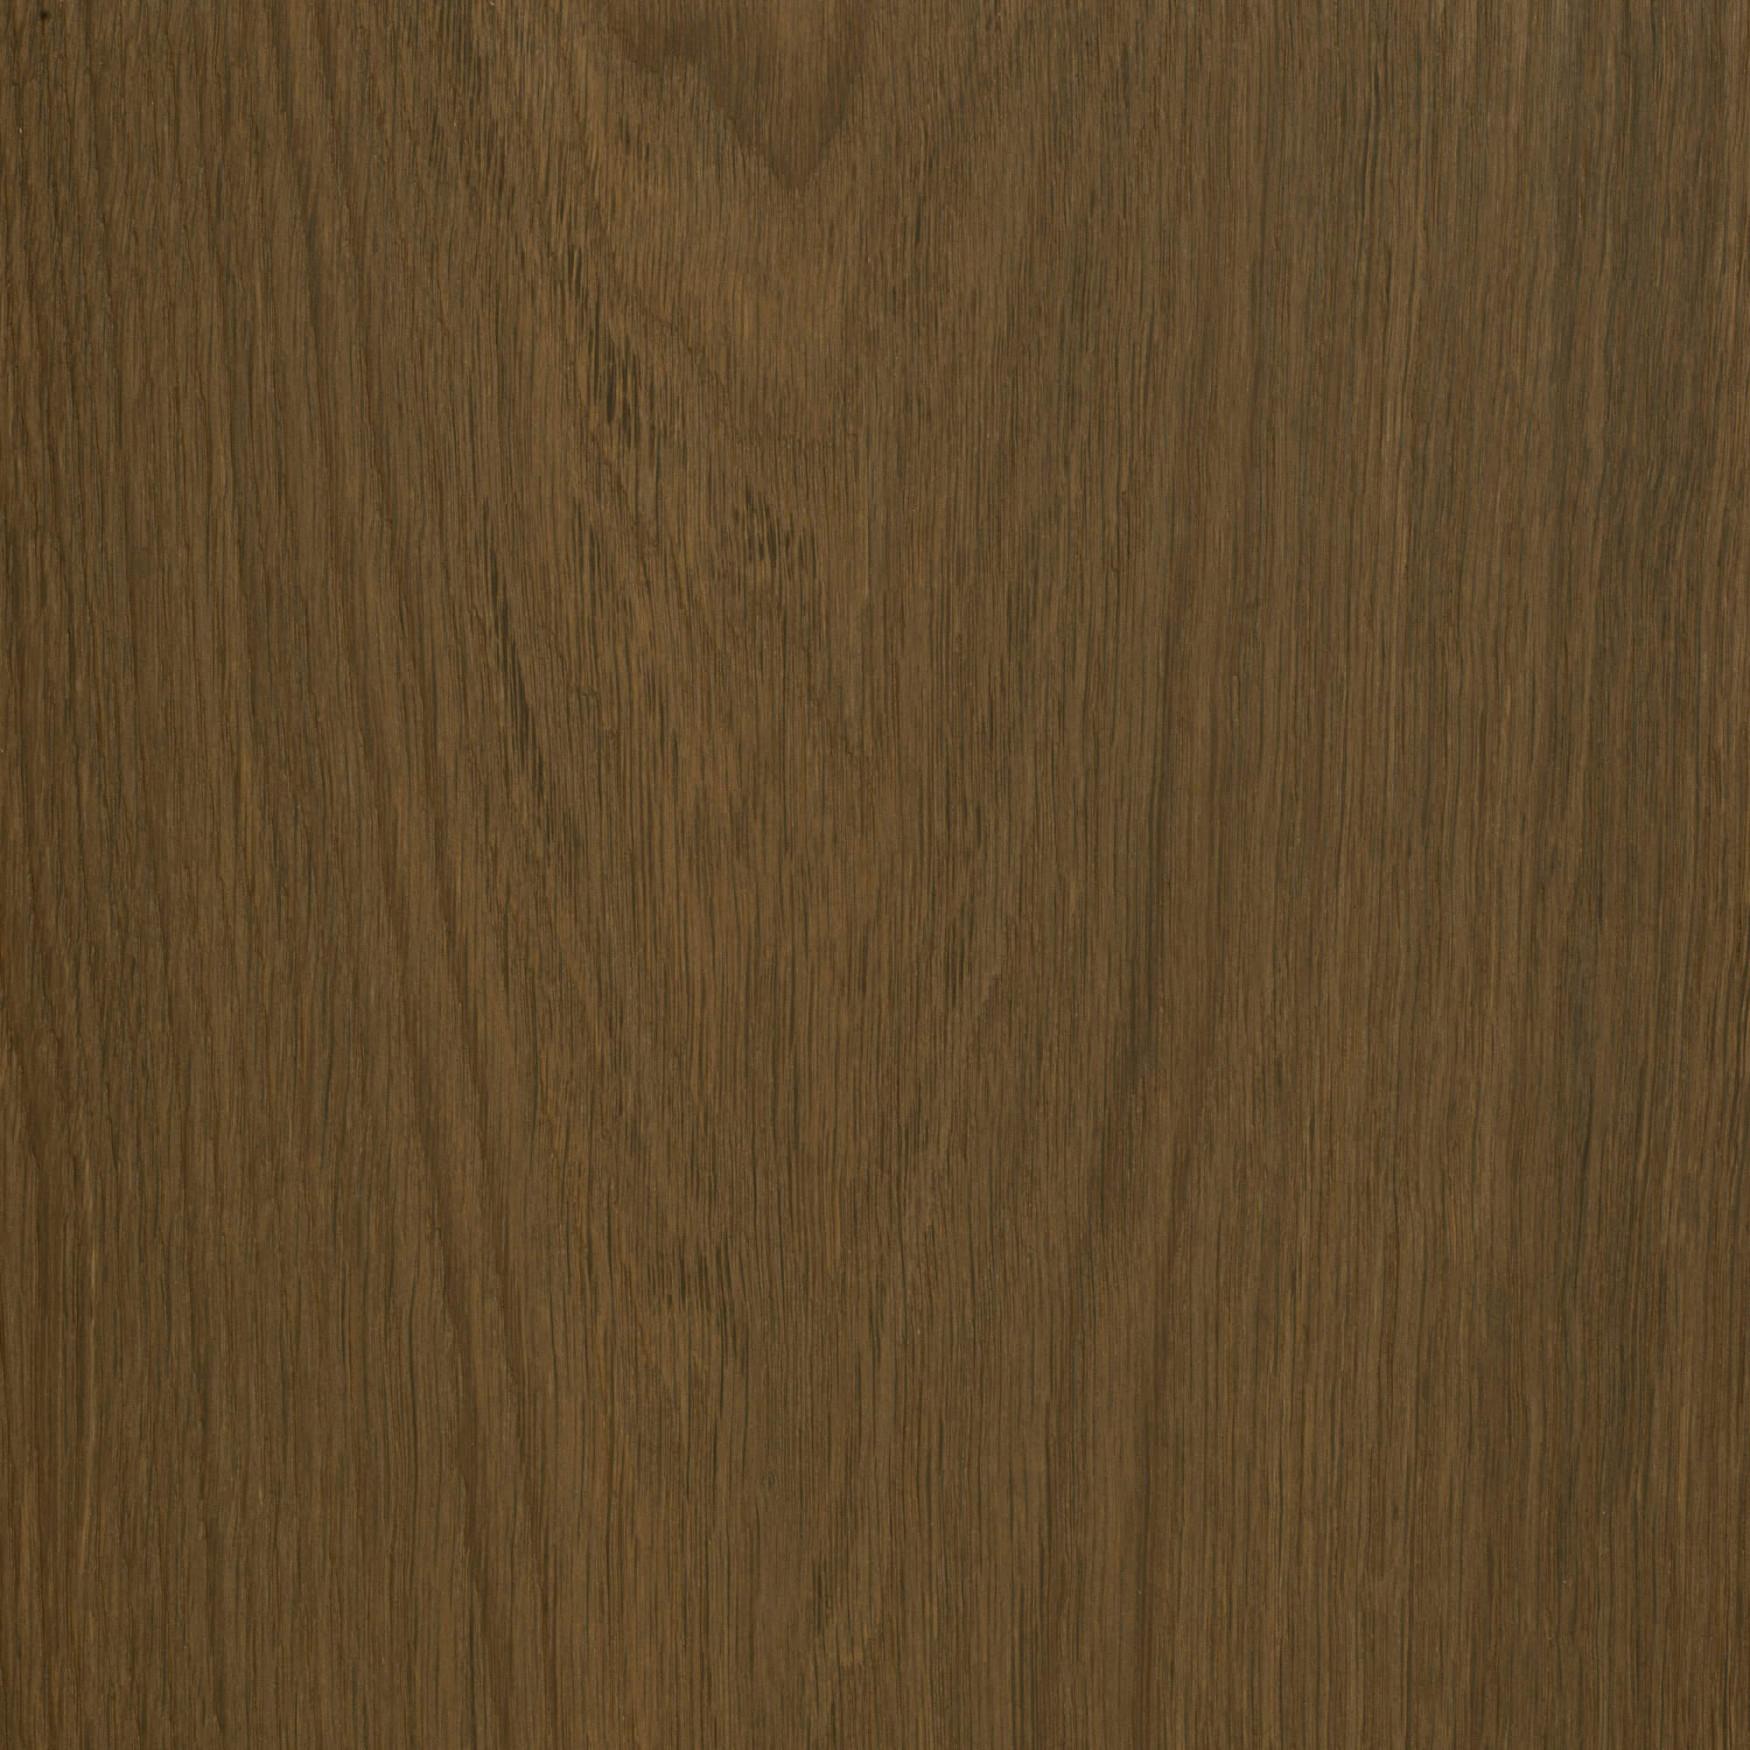 Element7-wide-plank-samples-RE-Medium-lighter